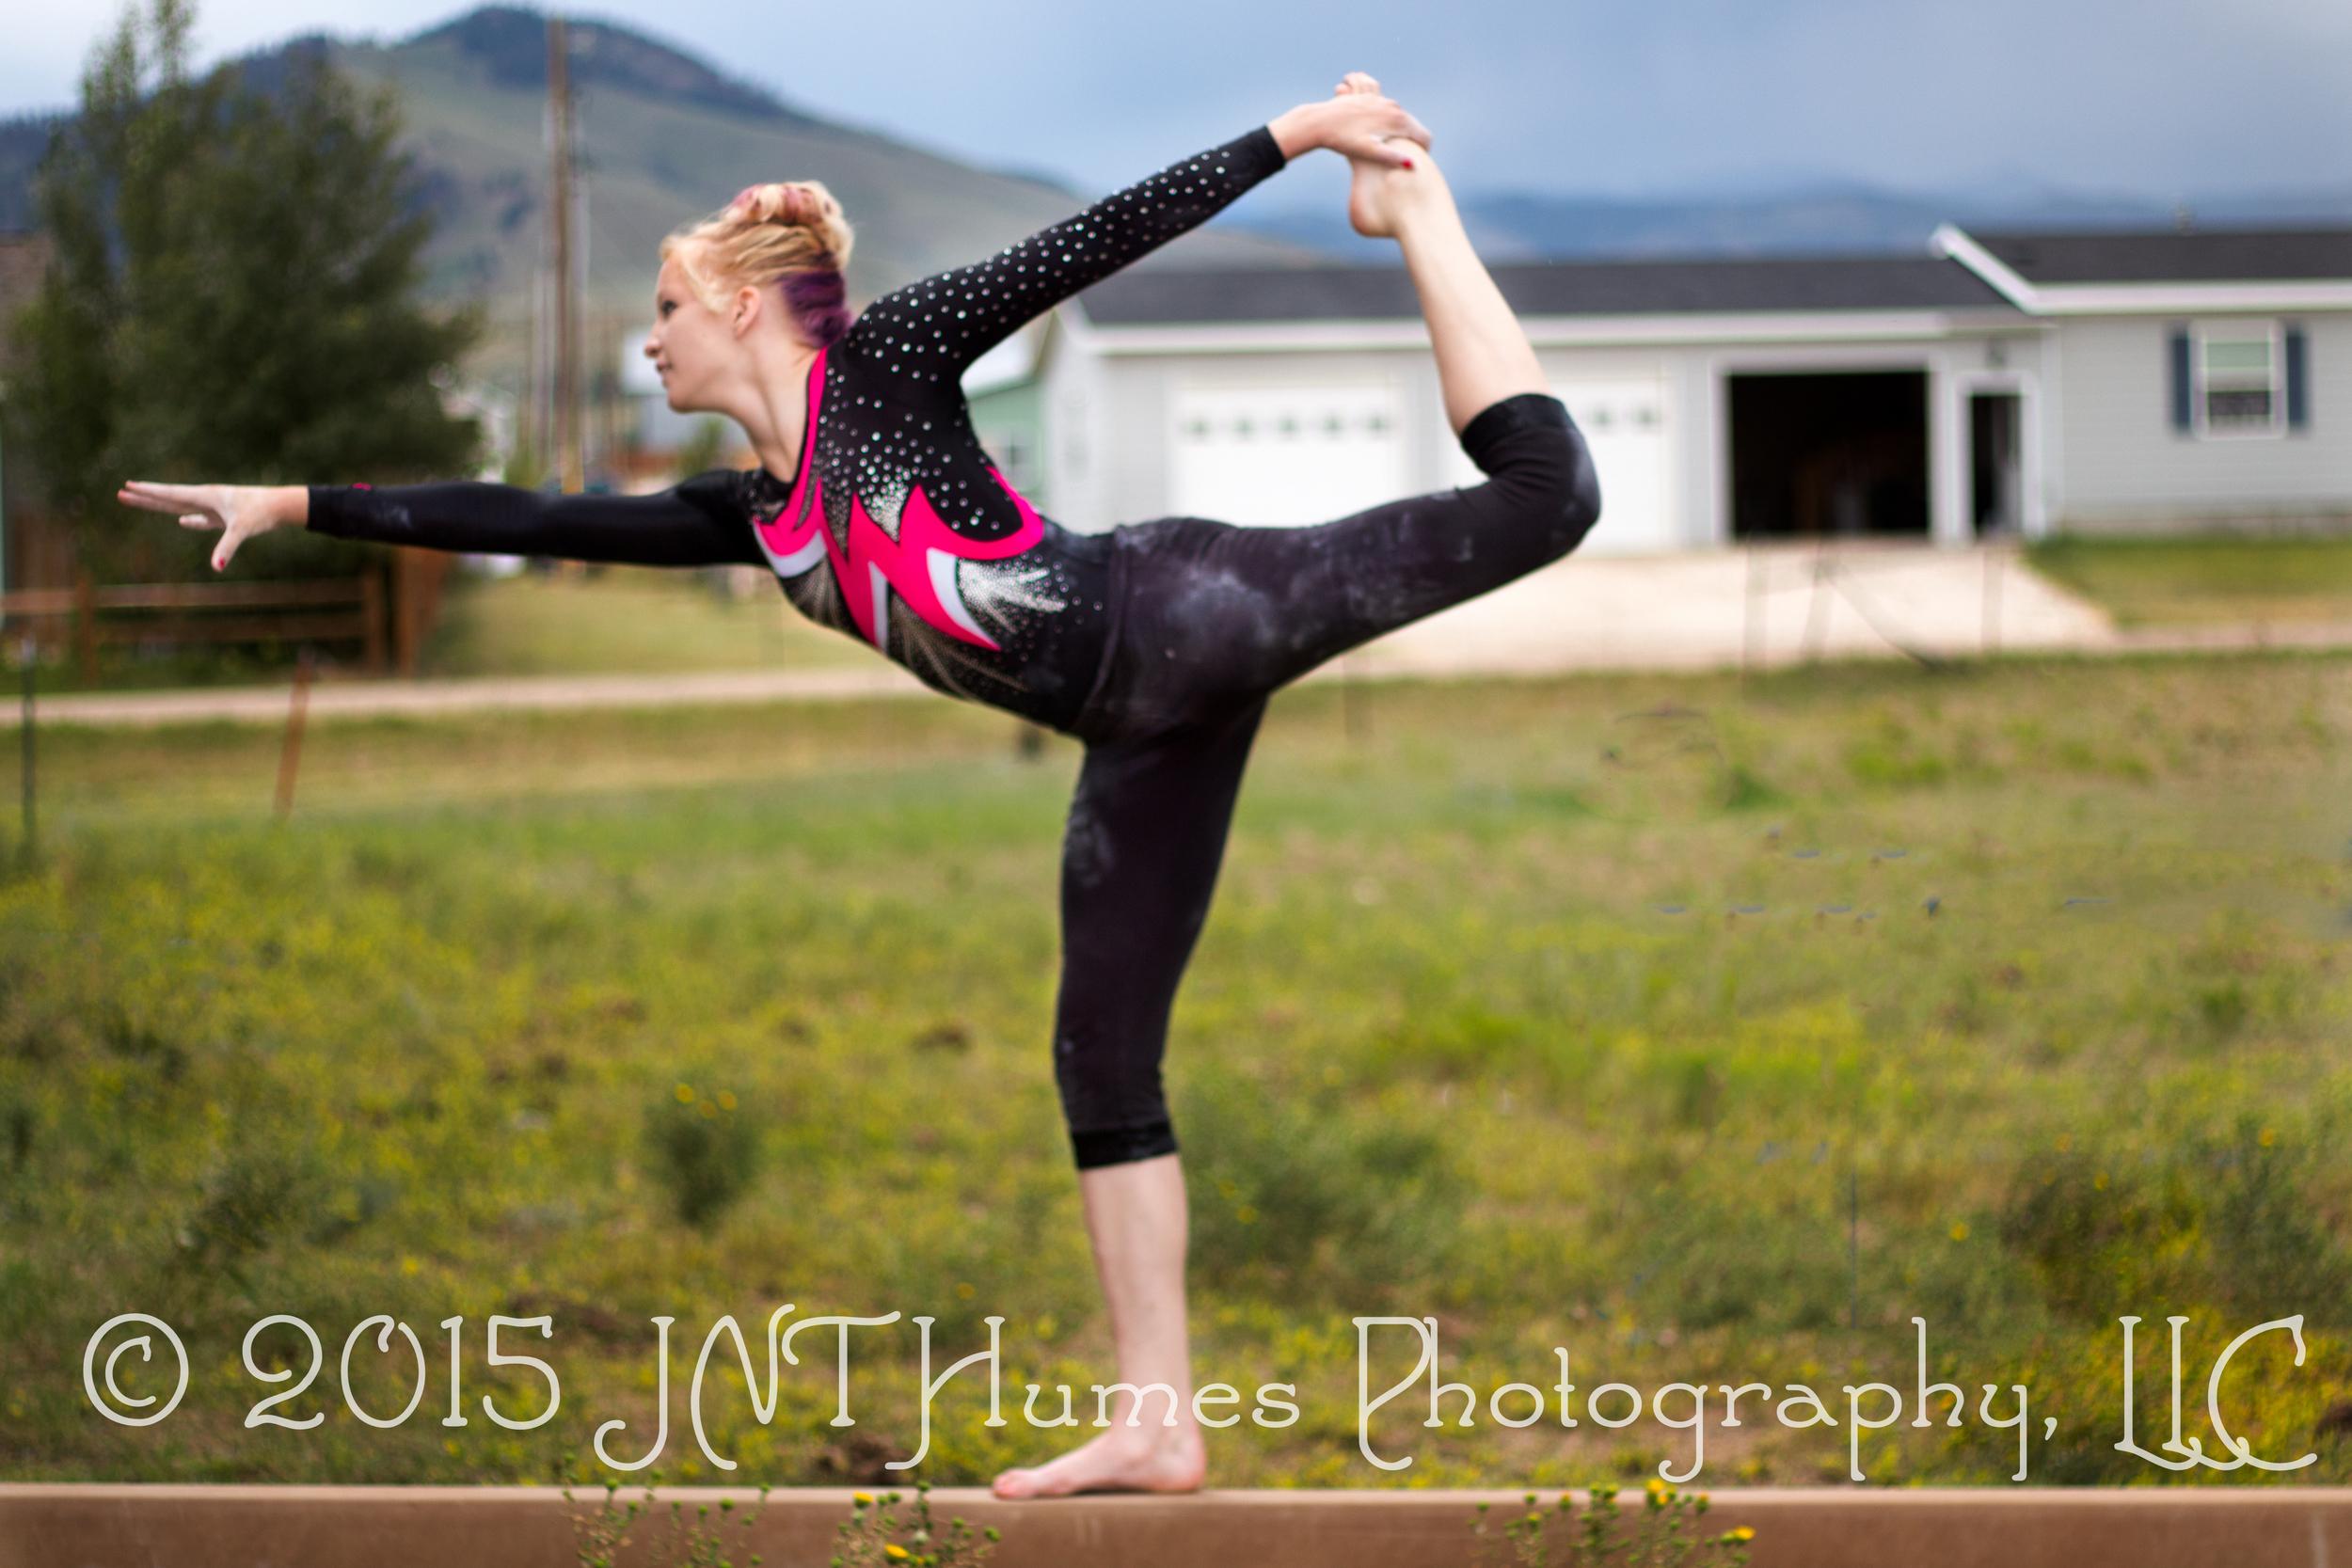 IMG_2370-Edit2015-08-05© 2015 JNT Humes Photography, LLC.jpg